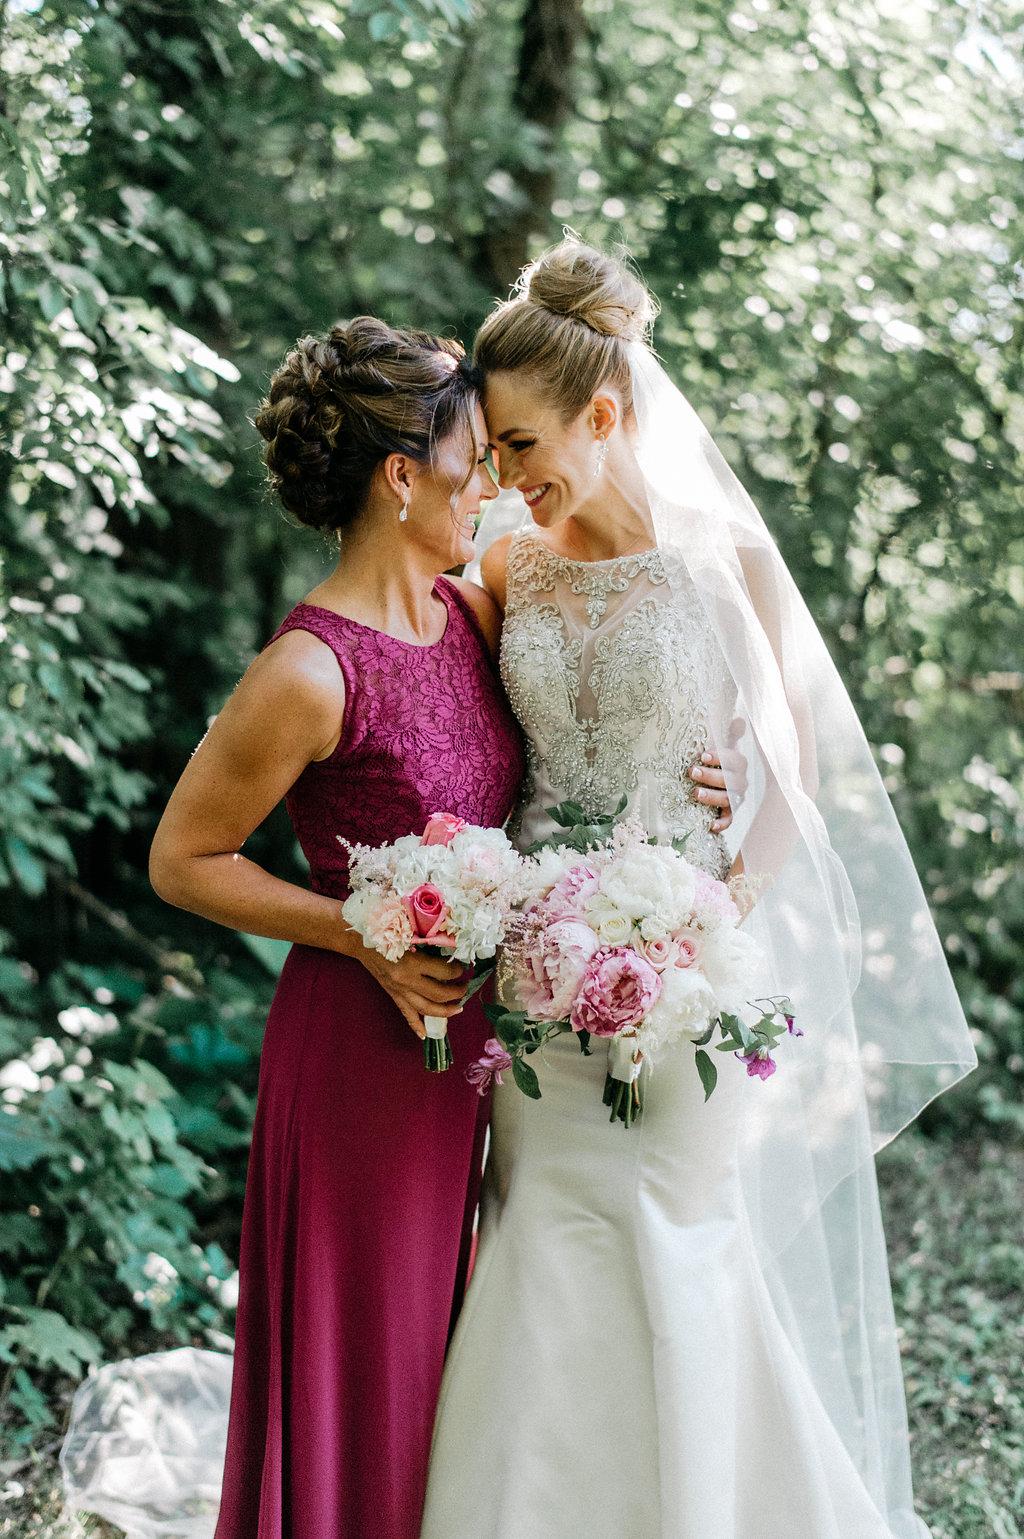 engle-olson-gene-pease-st-paul-wedding-25.jpg